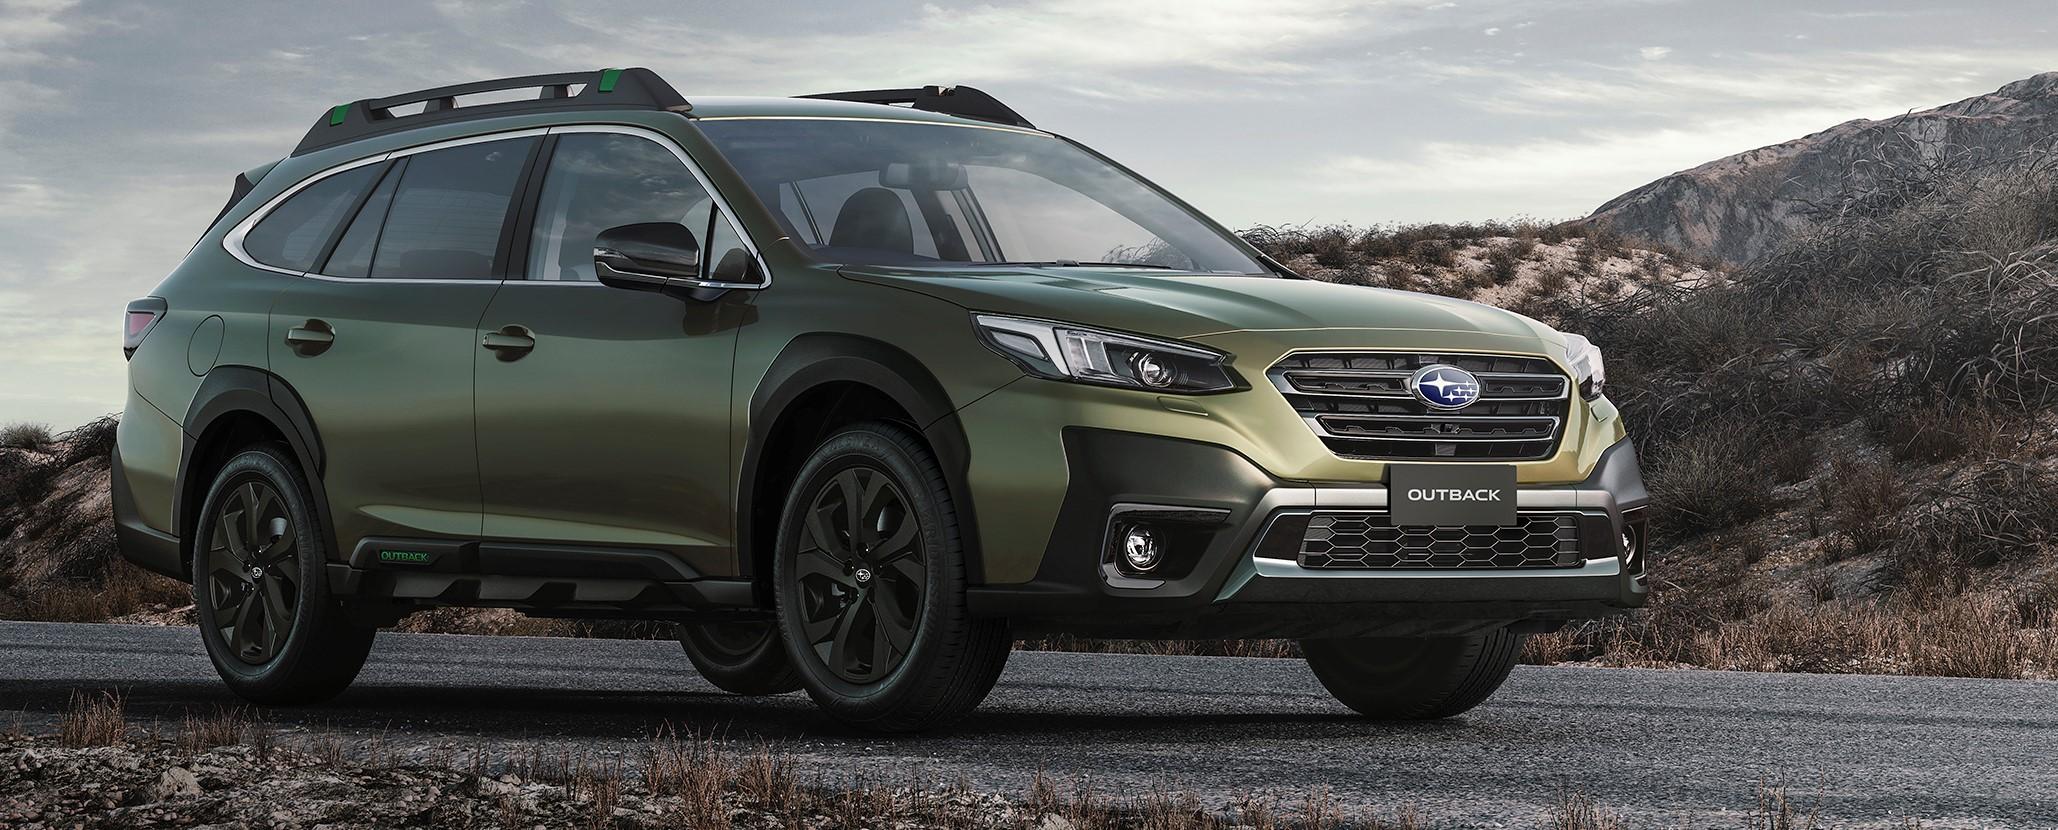 New Subaru Outback takes a bow